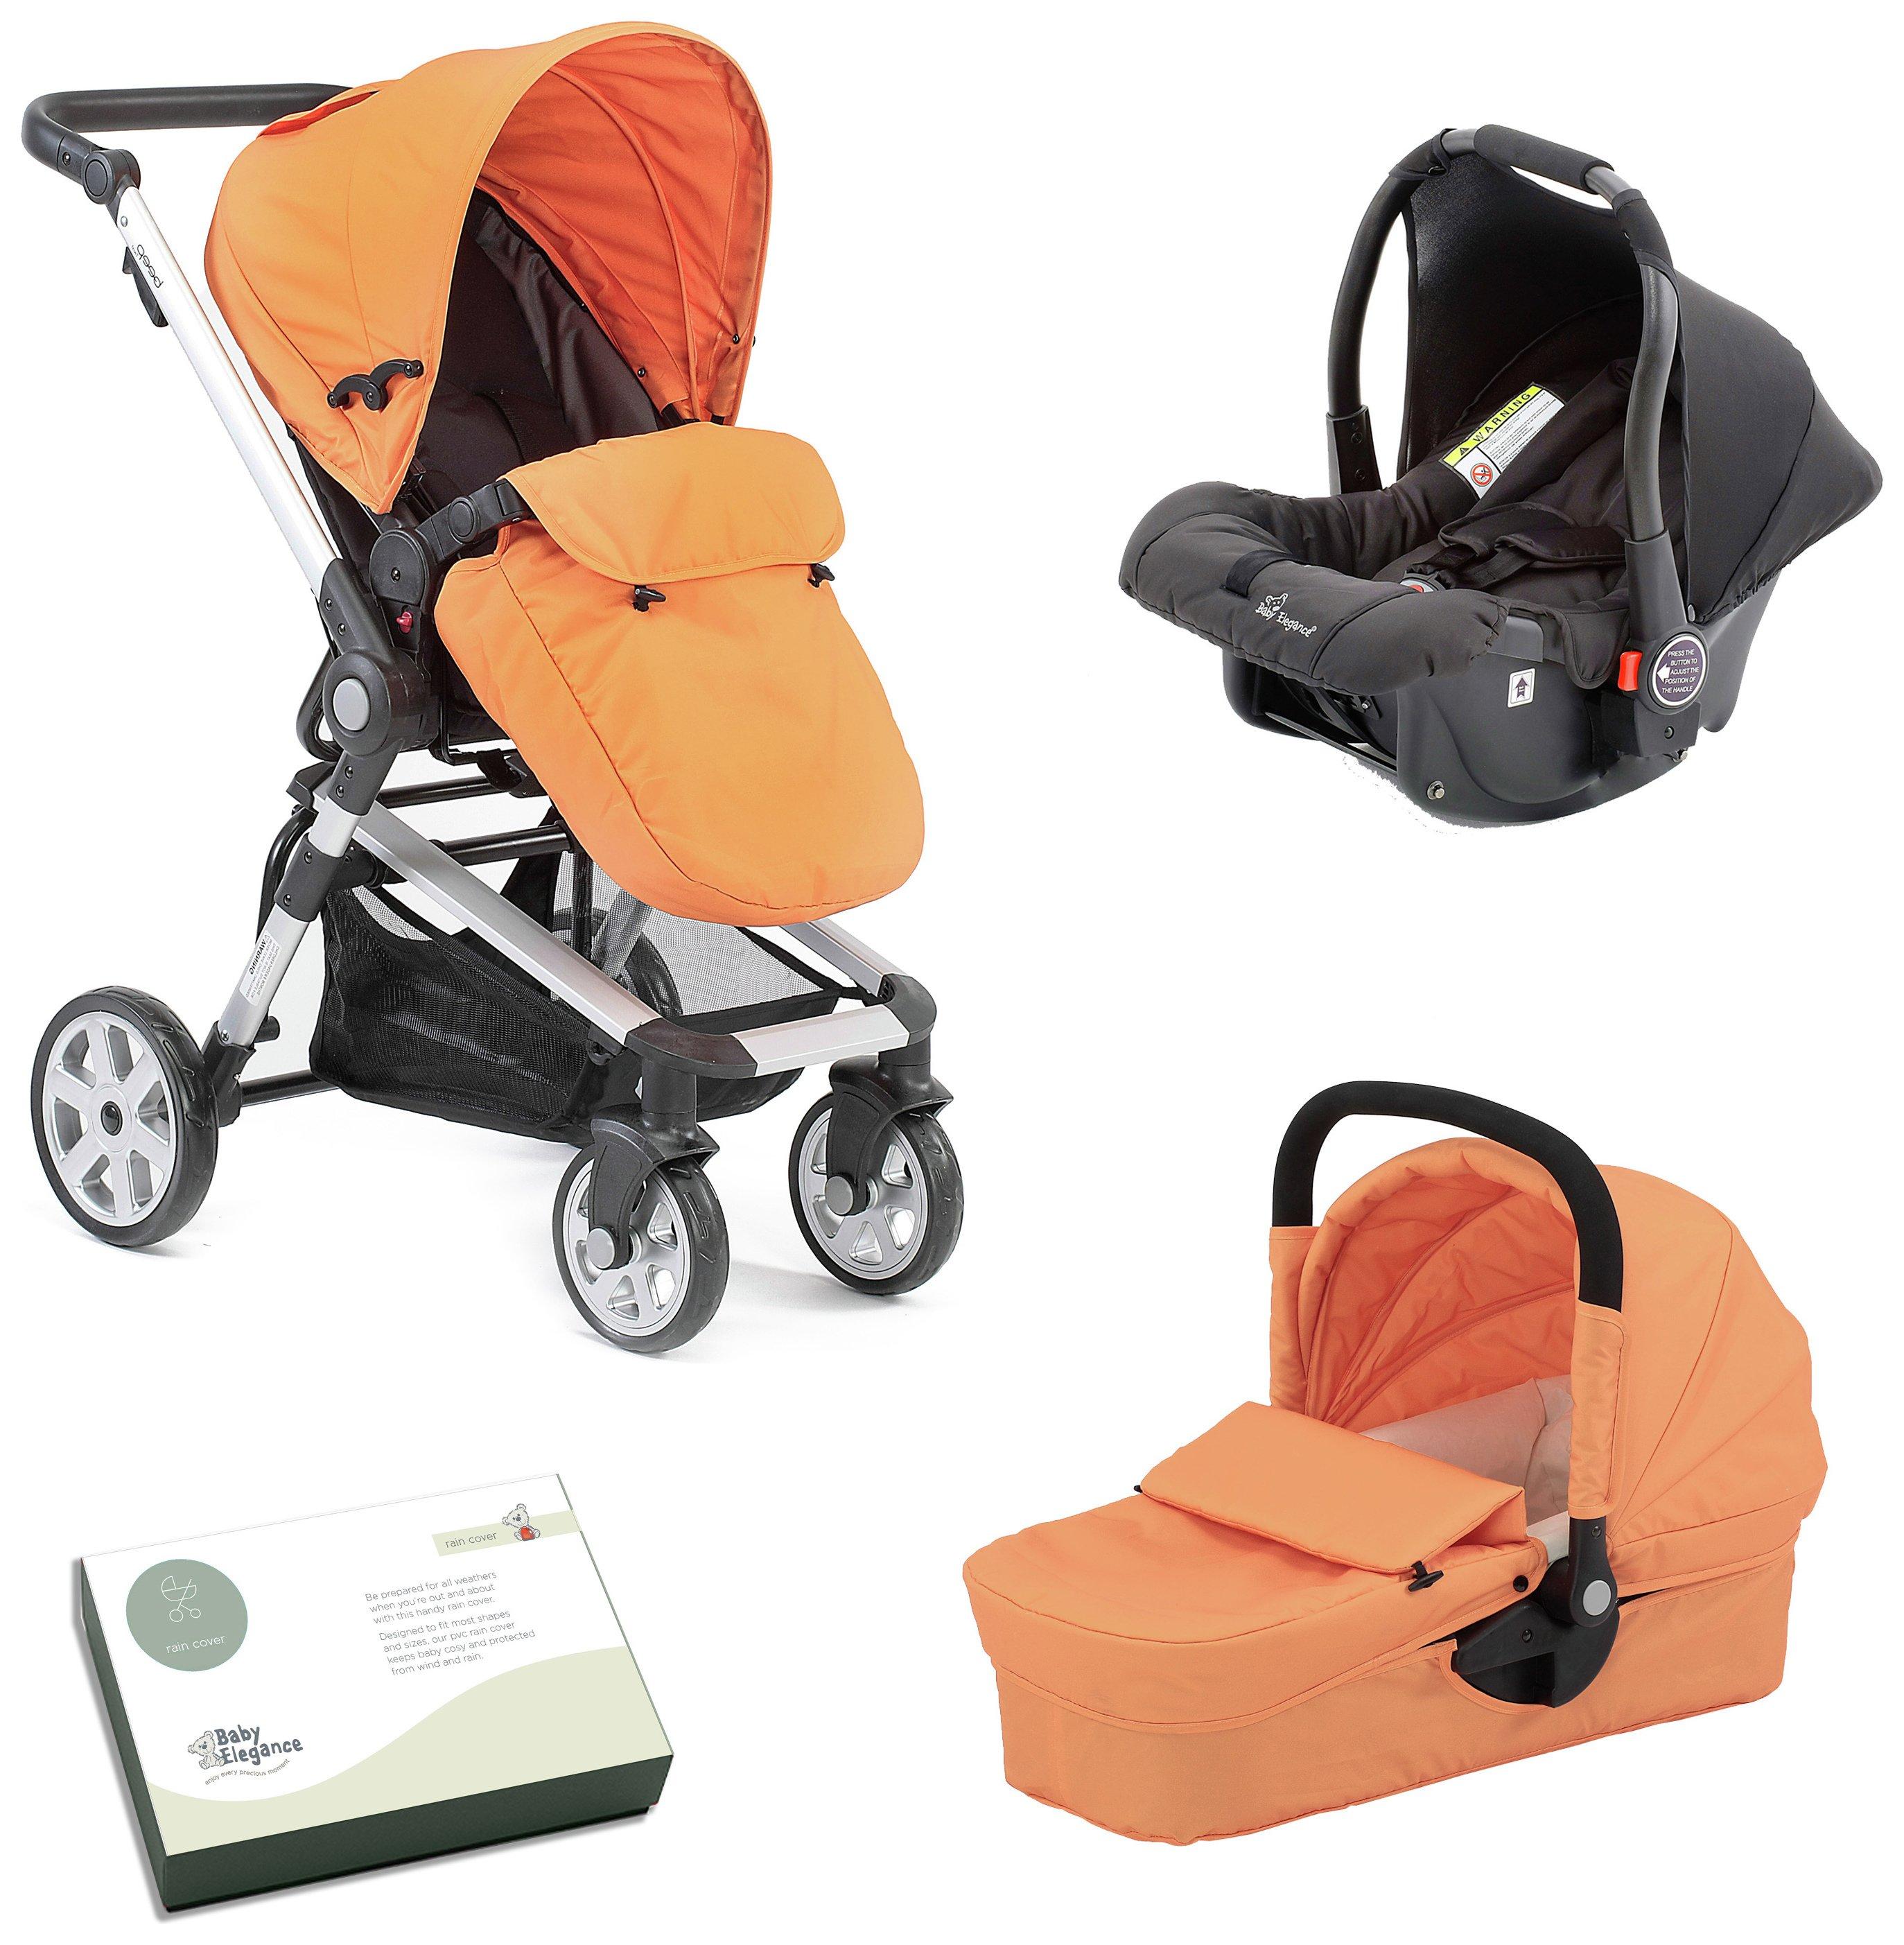 Image of Baby Elegance Beep Twist Travel System - Orange.